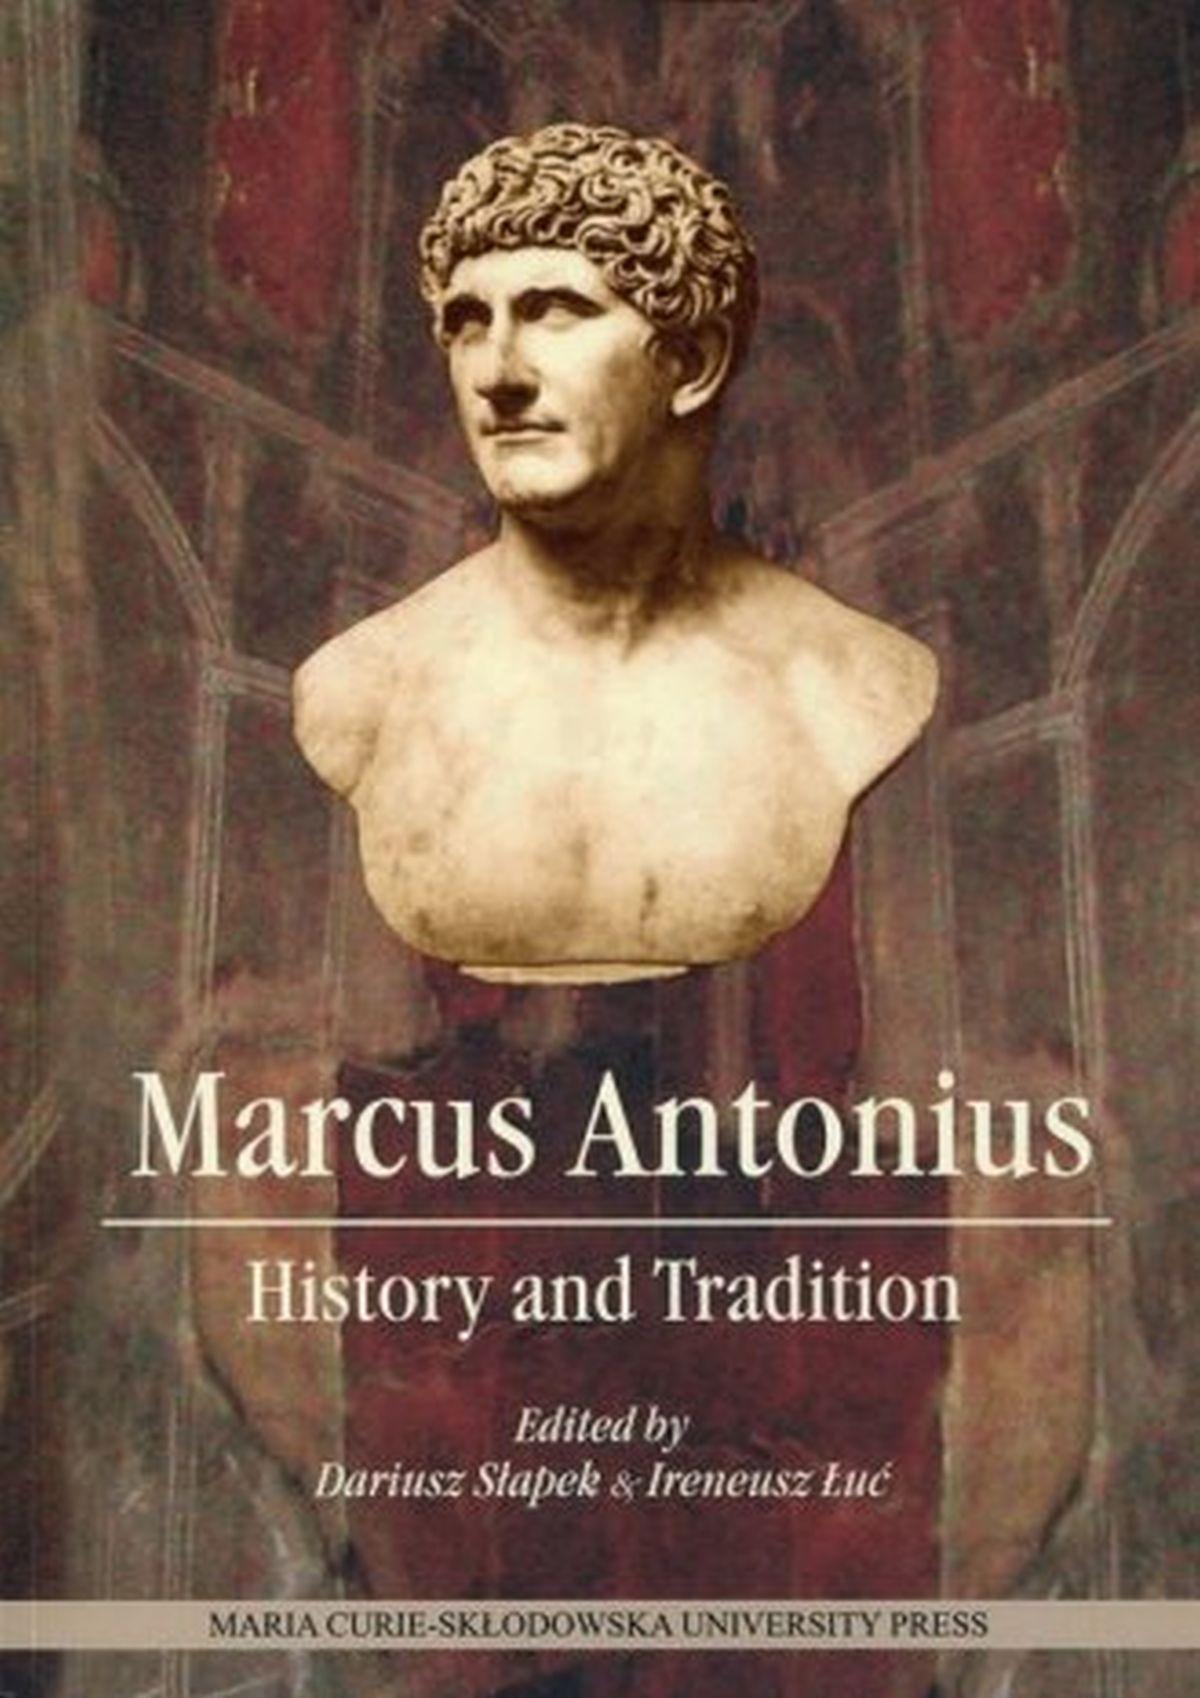 Dariusz Słapek, Ireneusz Łuć, Marcus Antoninus. History and Tradition